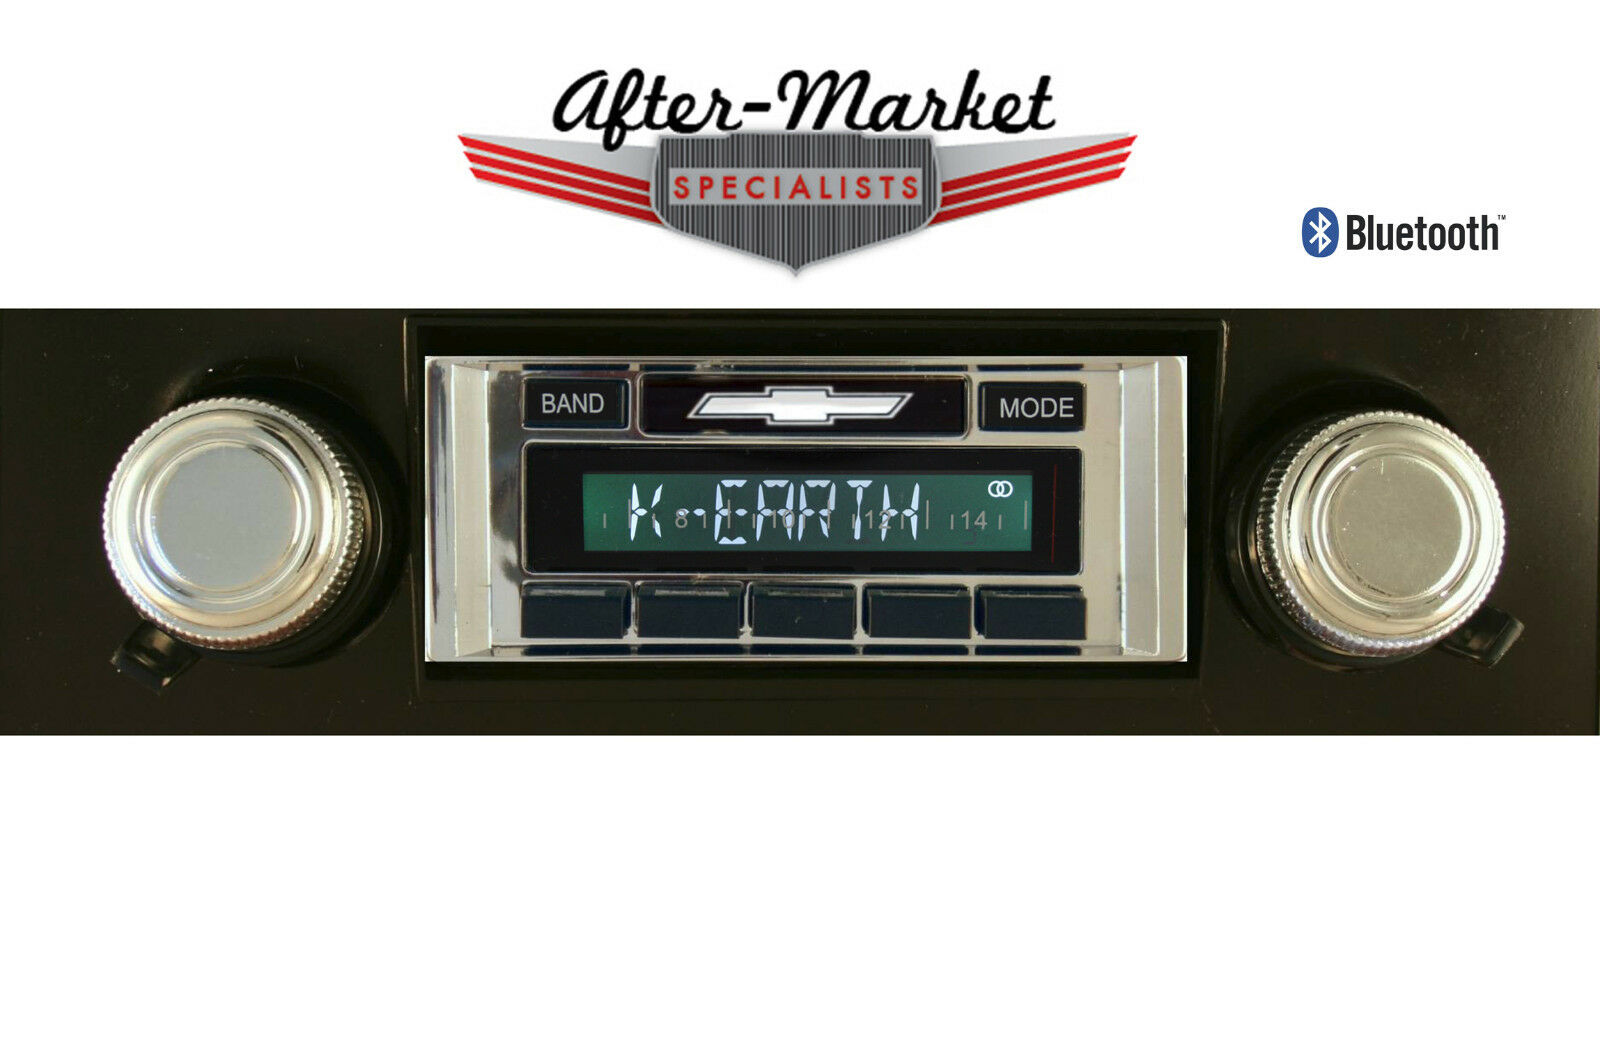 68 69 70 71 72 73 74 75 76 Nova Radio Custom Autosound USA 630 USA-630 Bluetooth